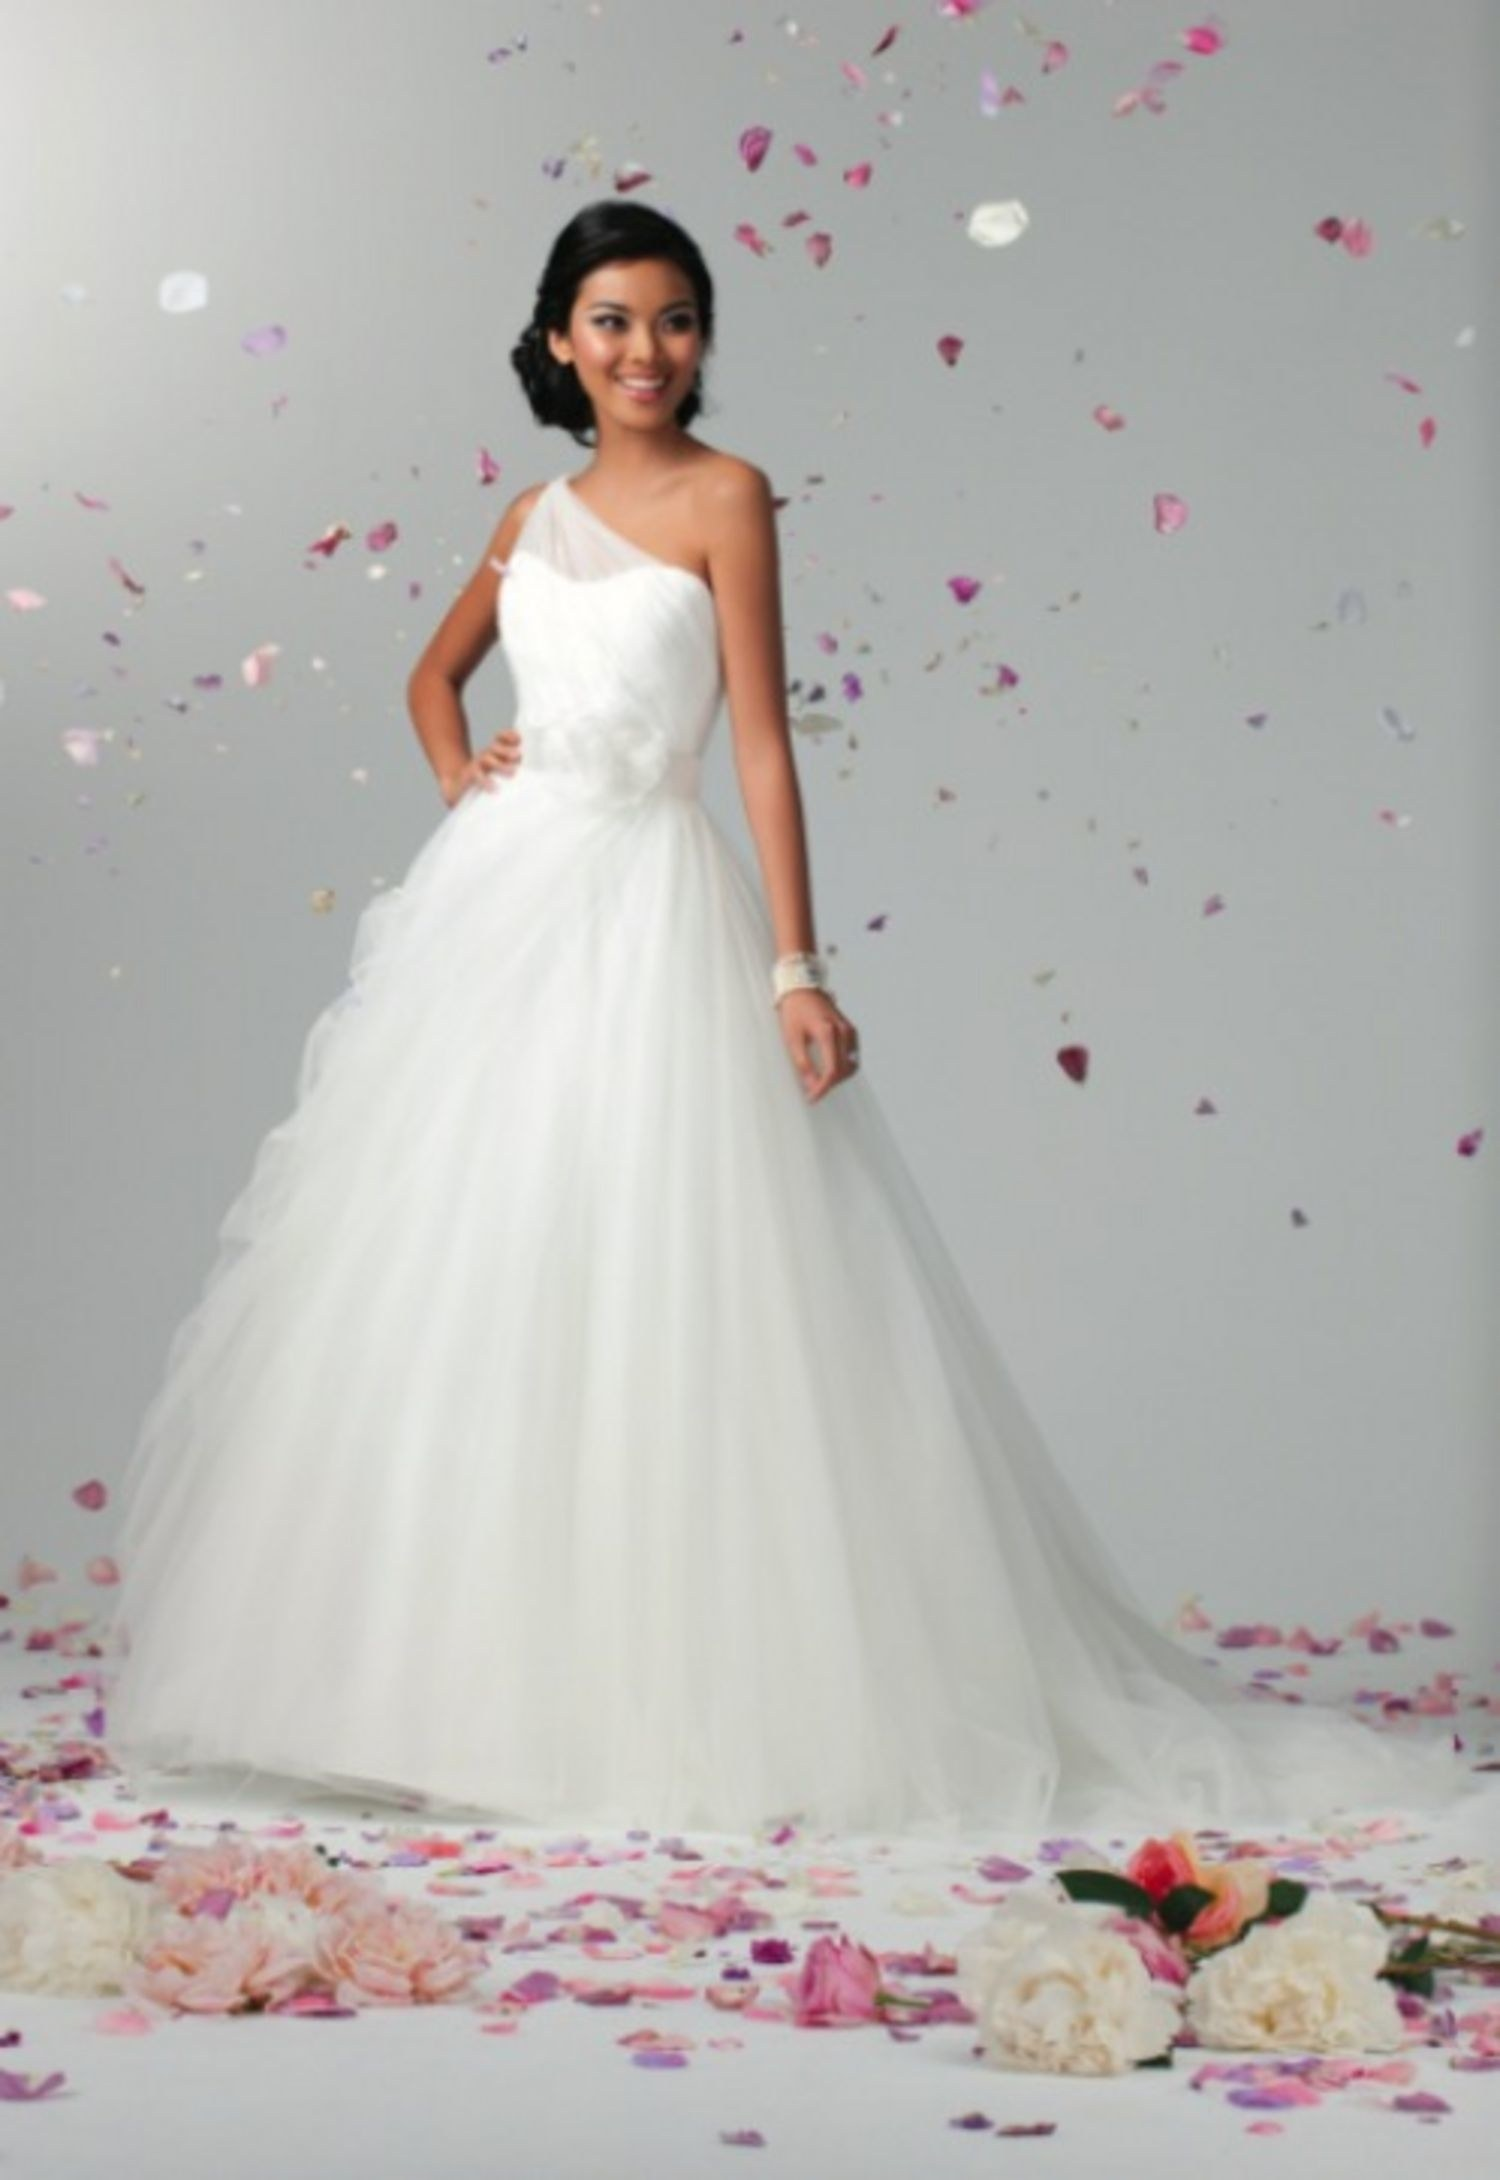 wedding dresses models photo - 1